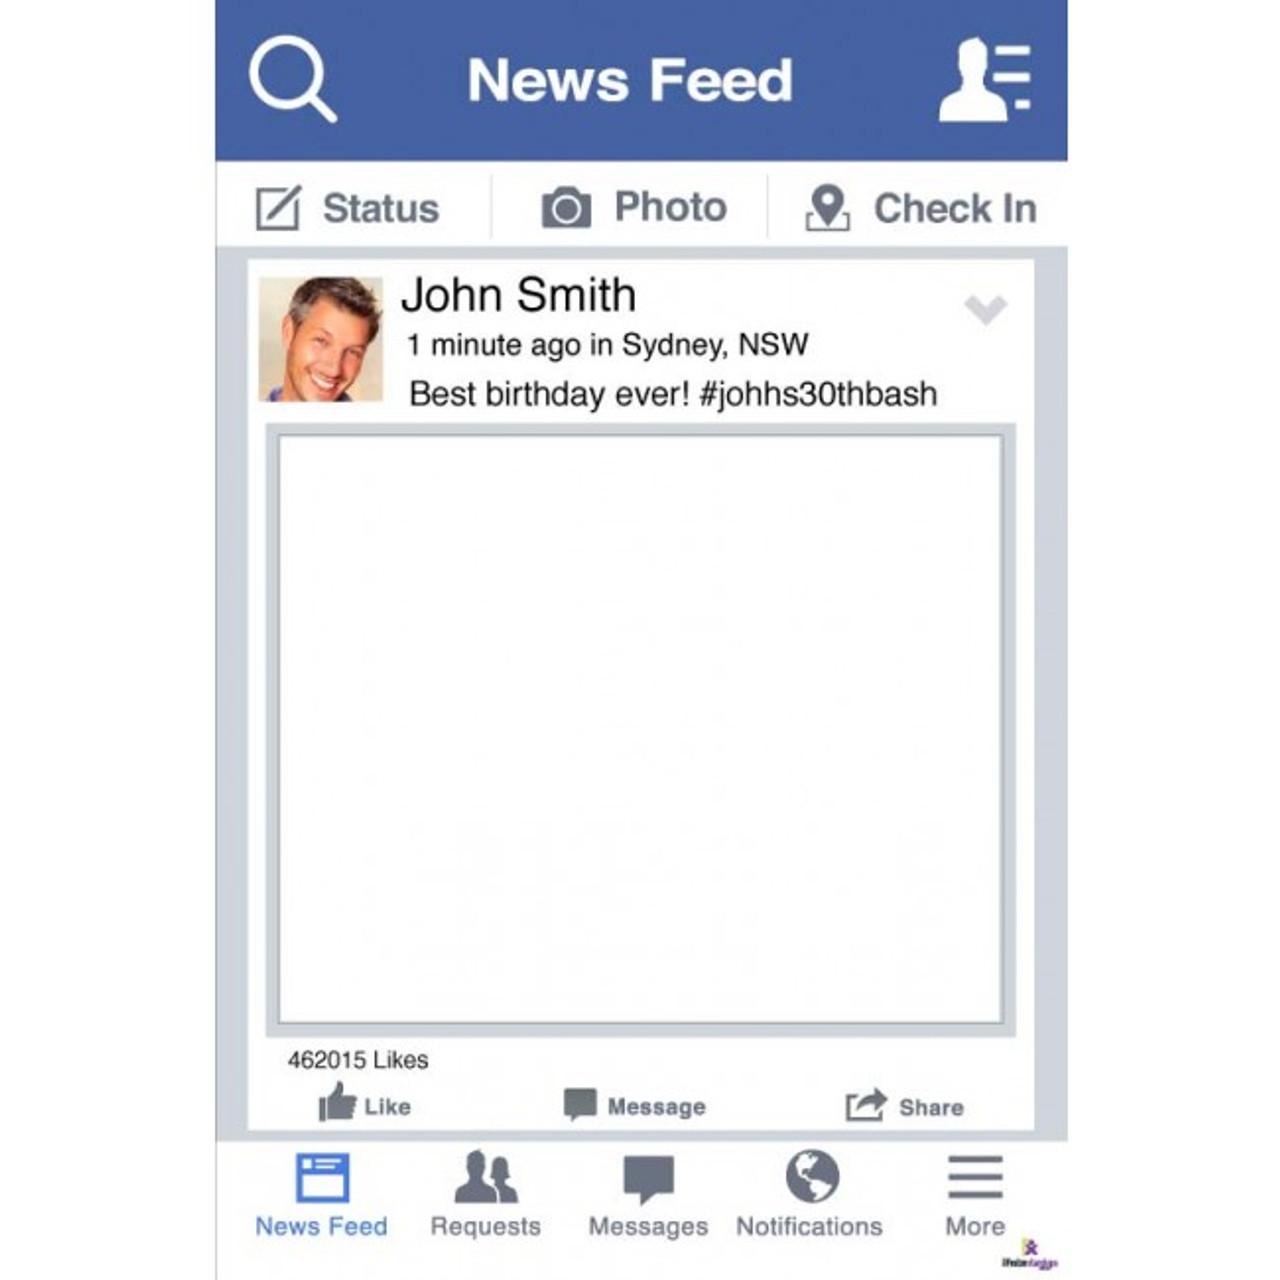 Prop, pictures, instagram, facebook,tinder, cut out ,frame ,Board, Nightclubs, Events, Wedding, selfie